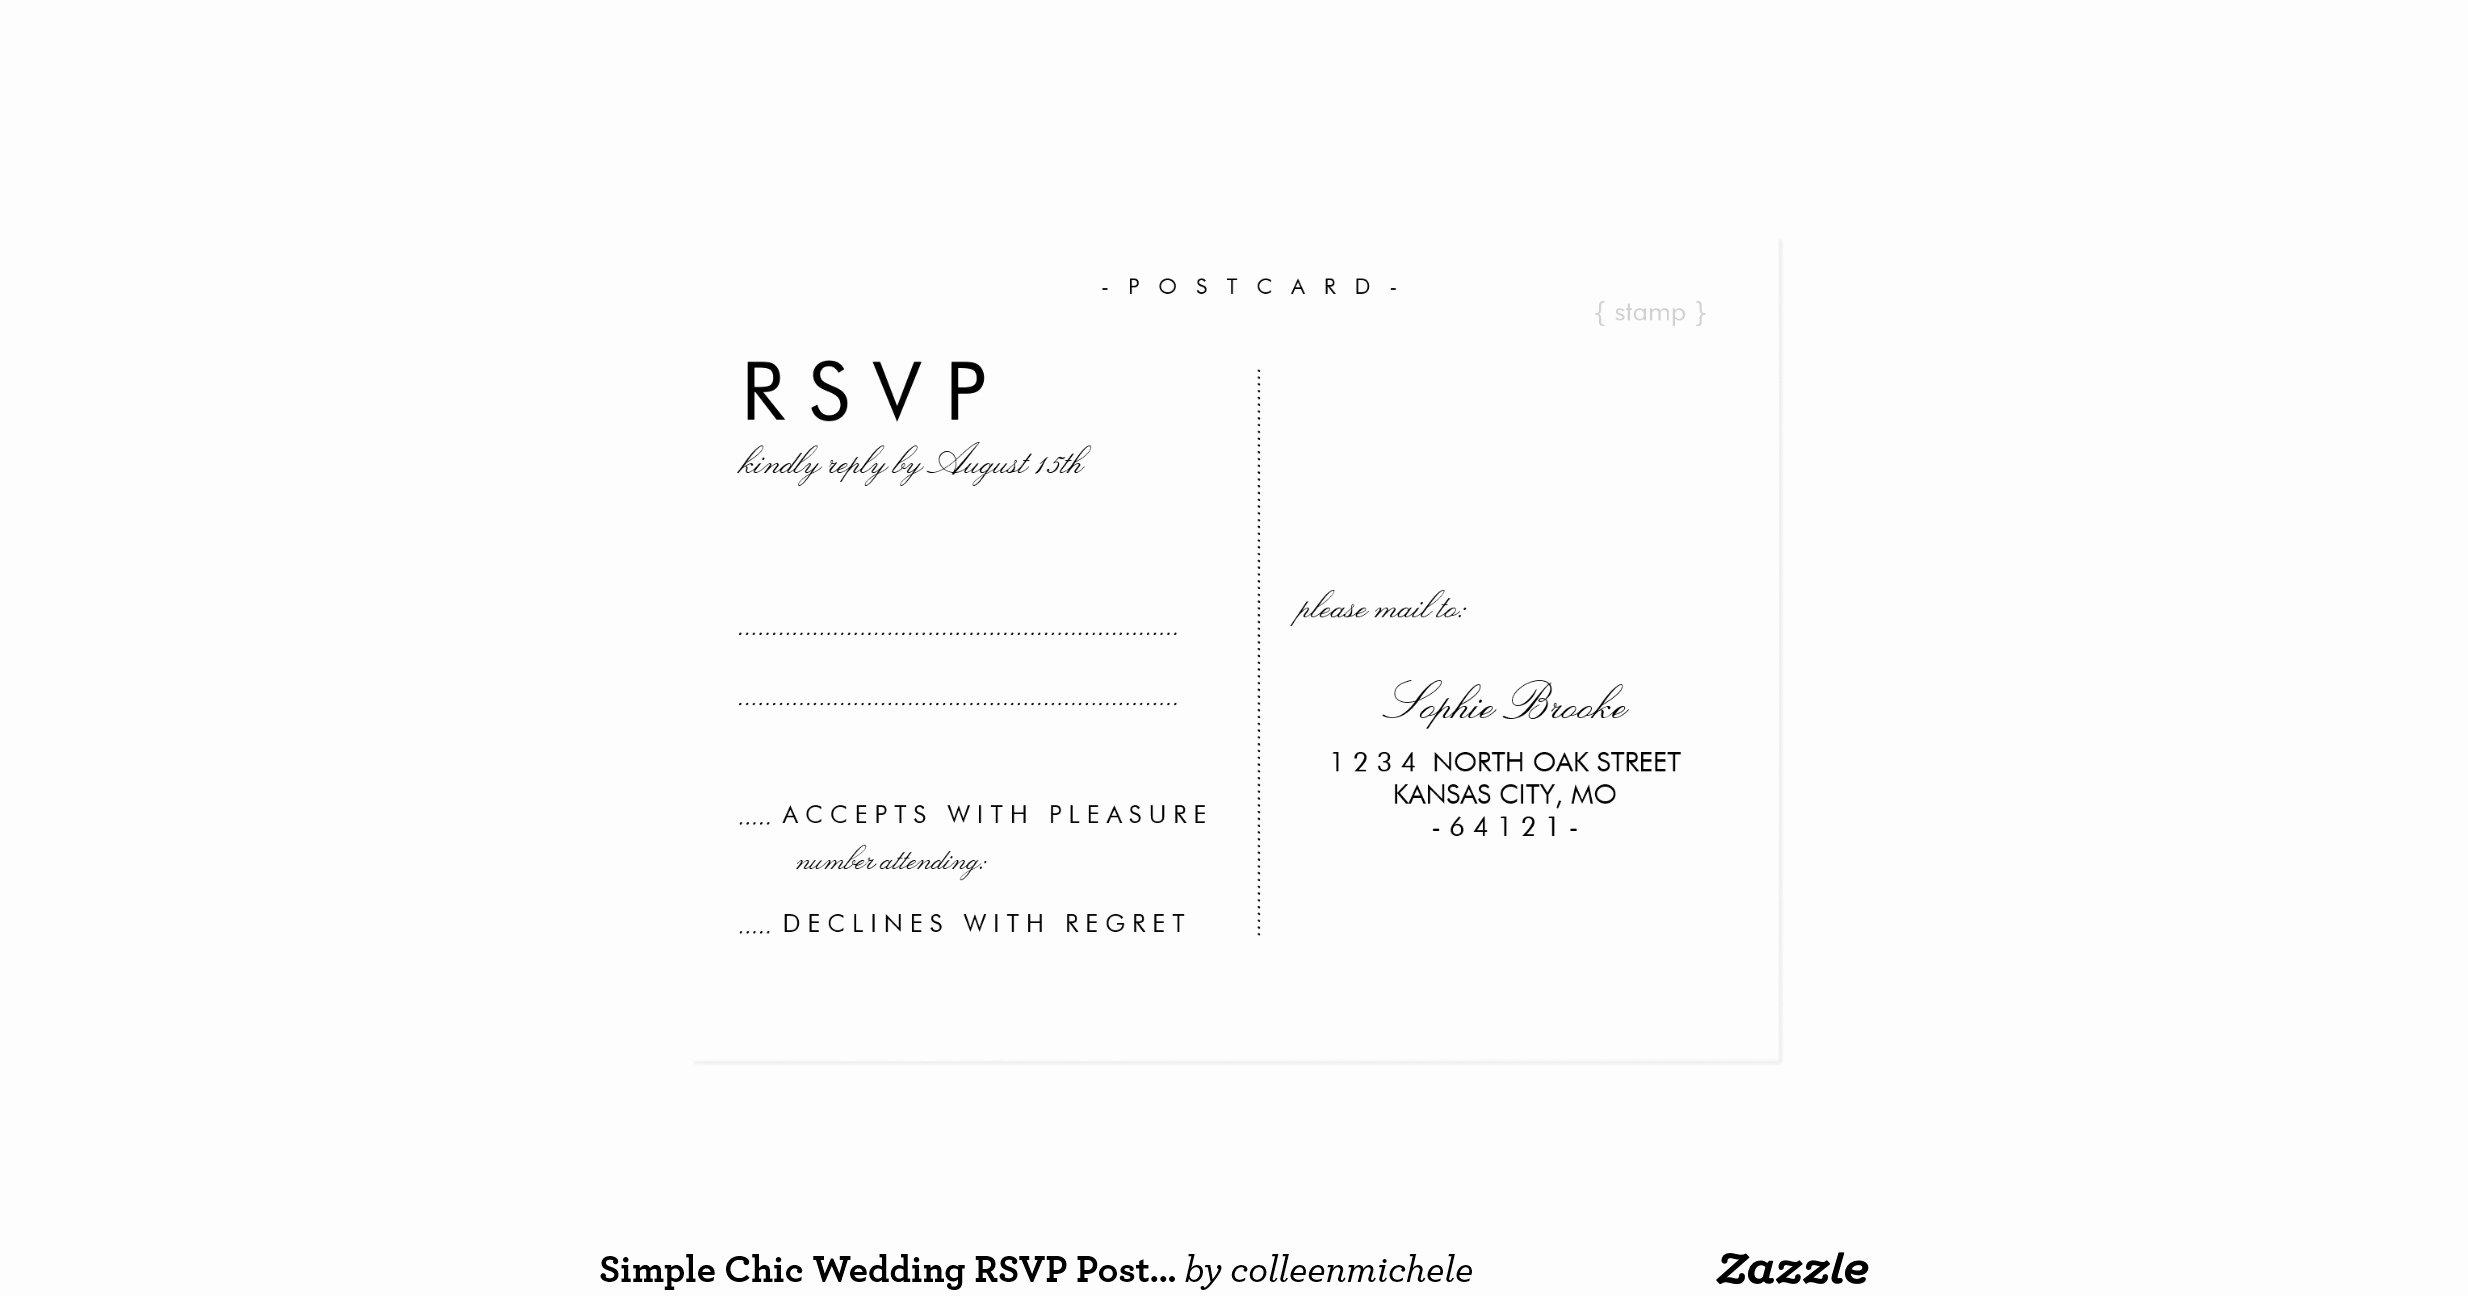 Wedding Rsvp Postcards Template Inspirational Simple Chic Wedding Rsvp Postcard Template